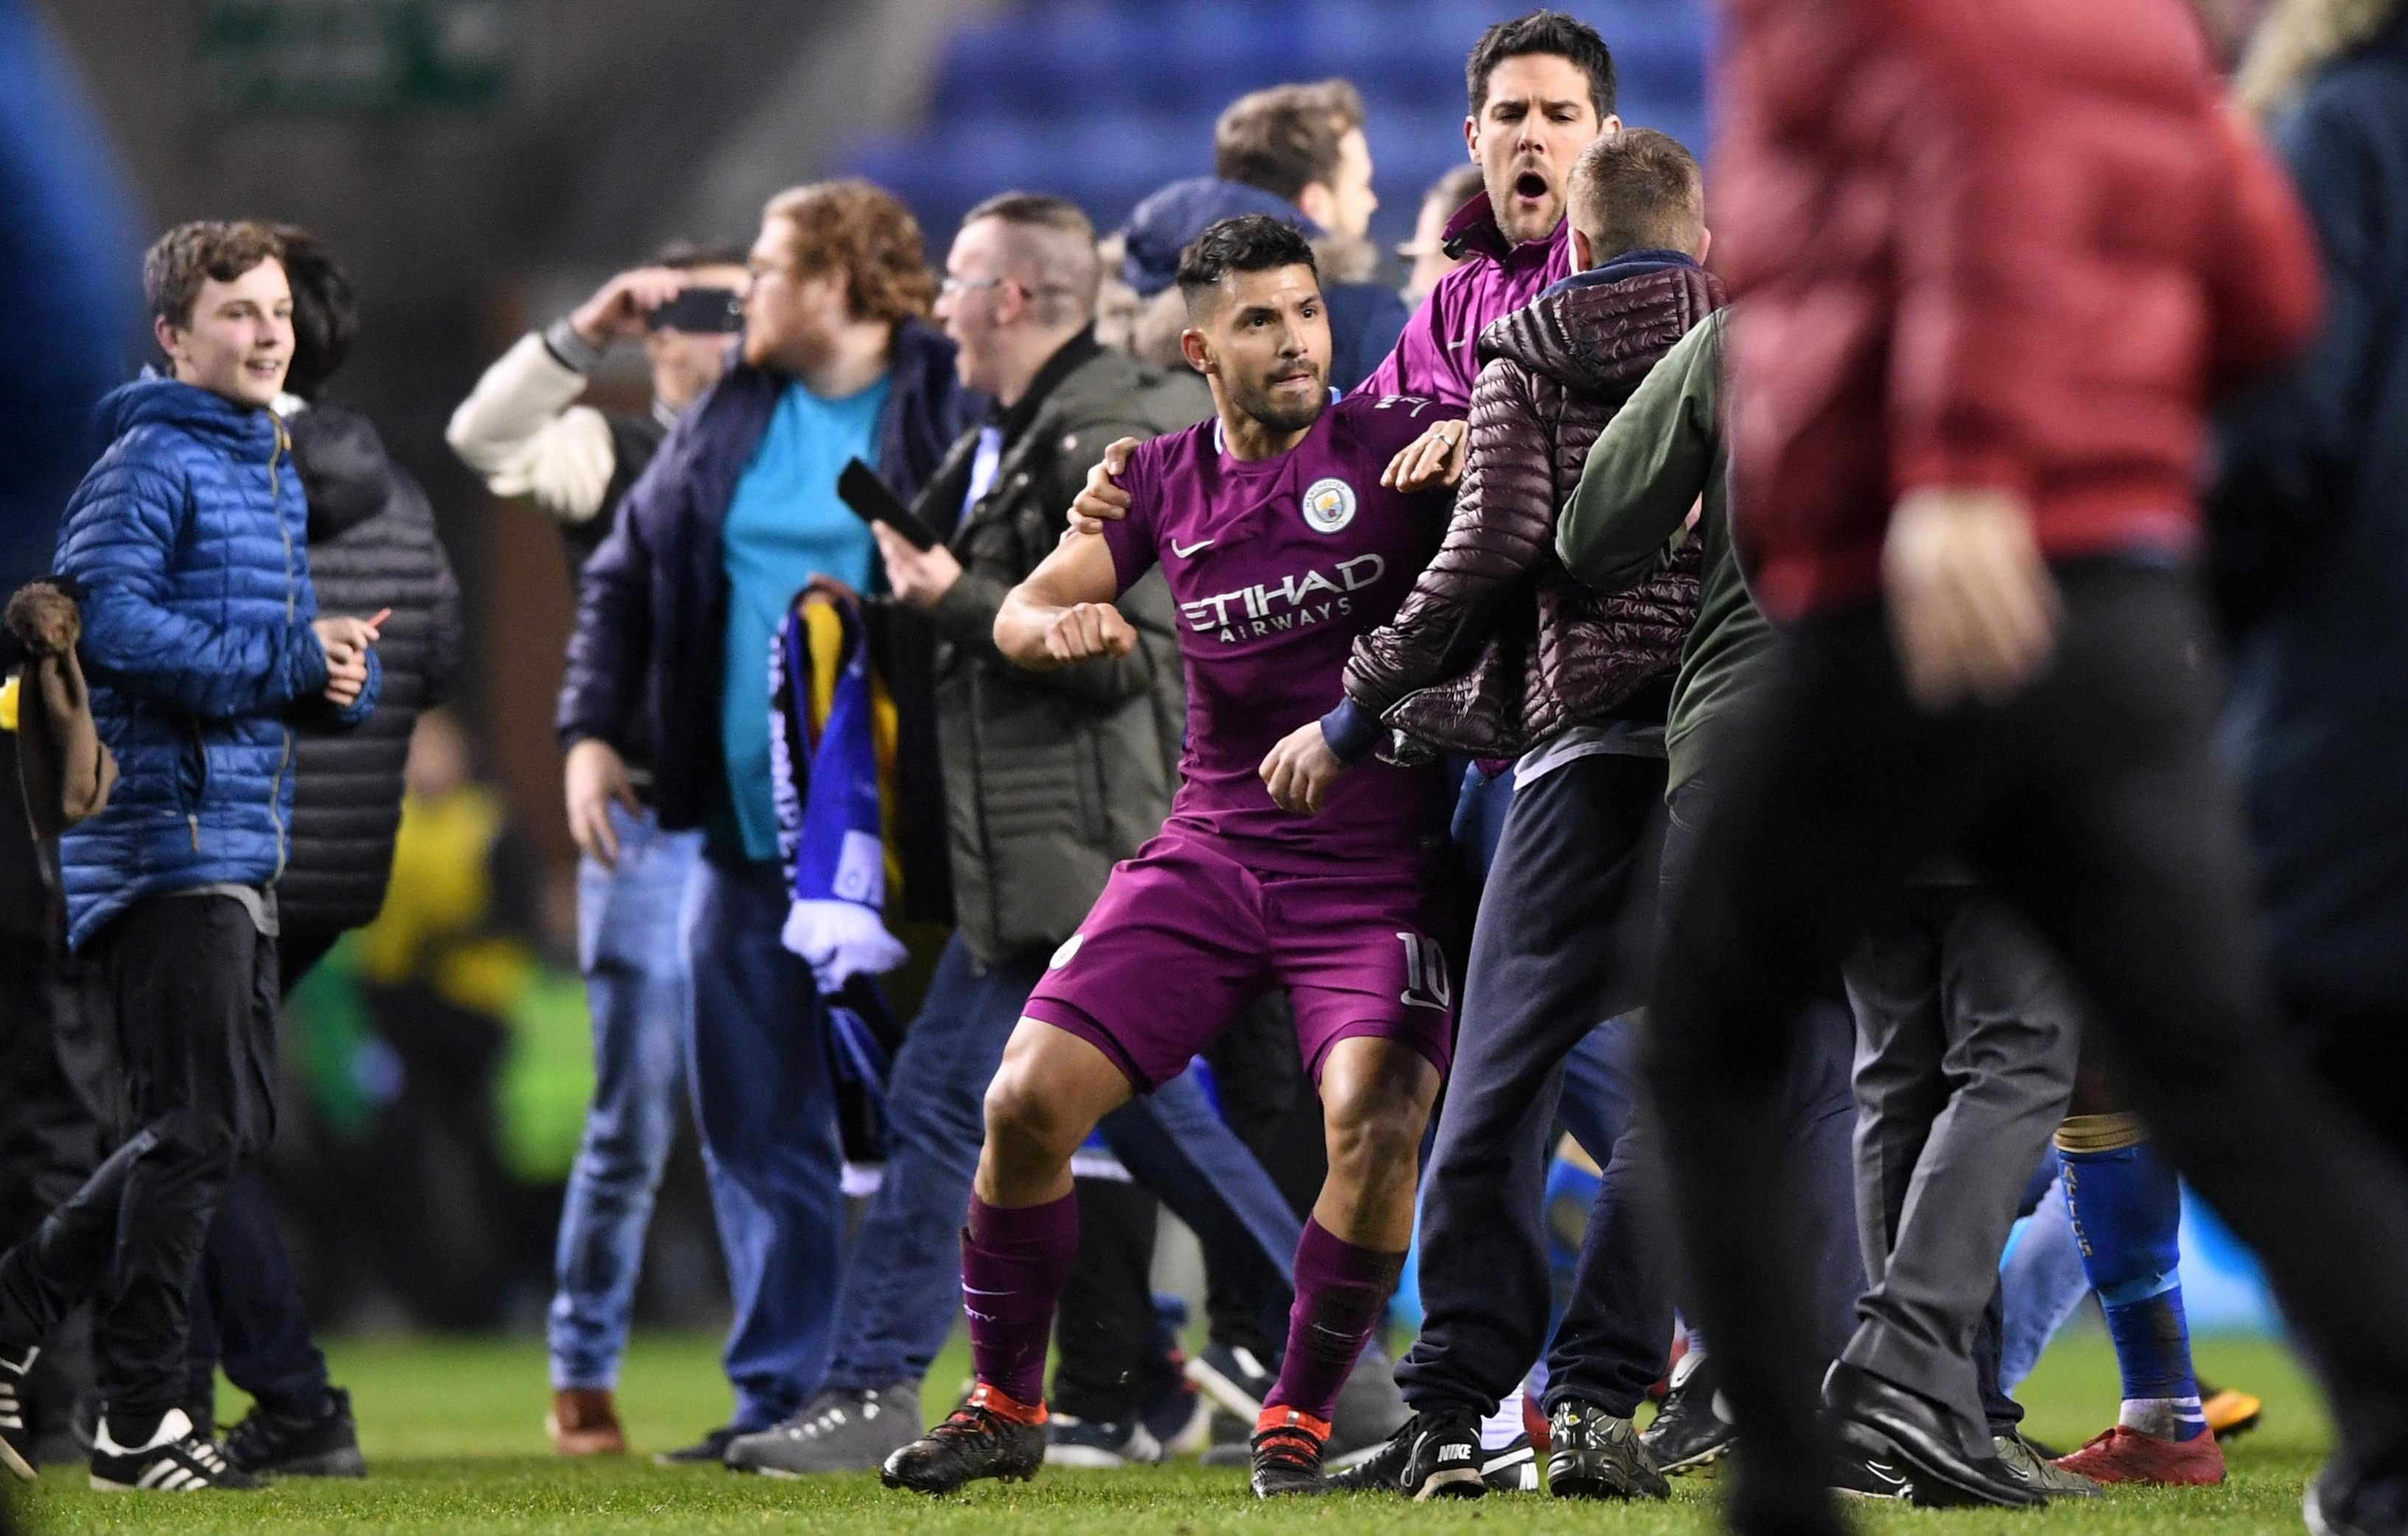 Aguero's clash with a fan